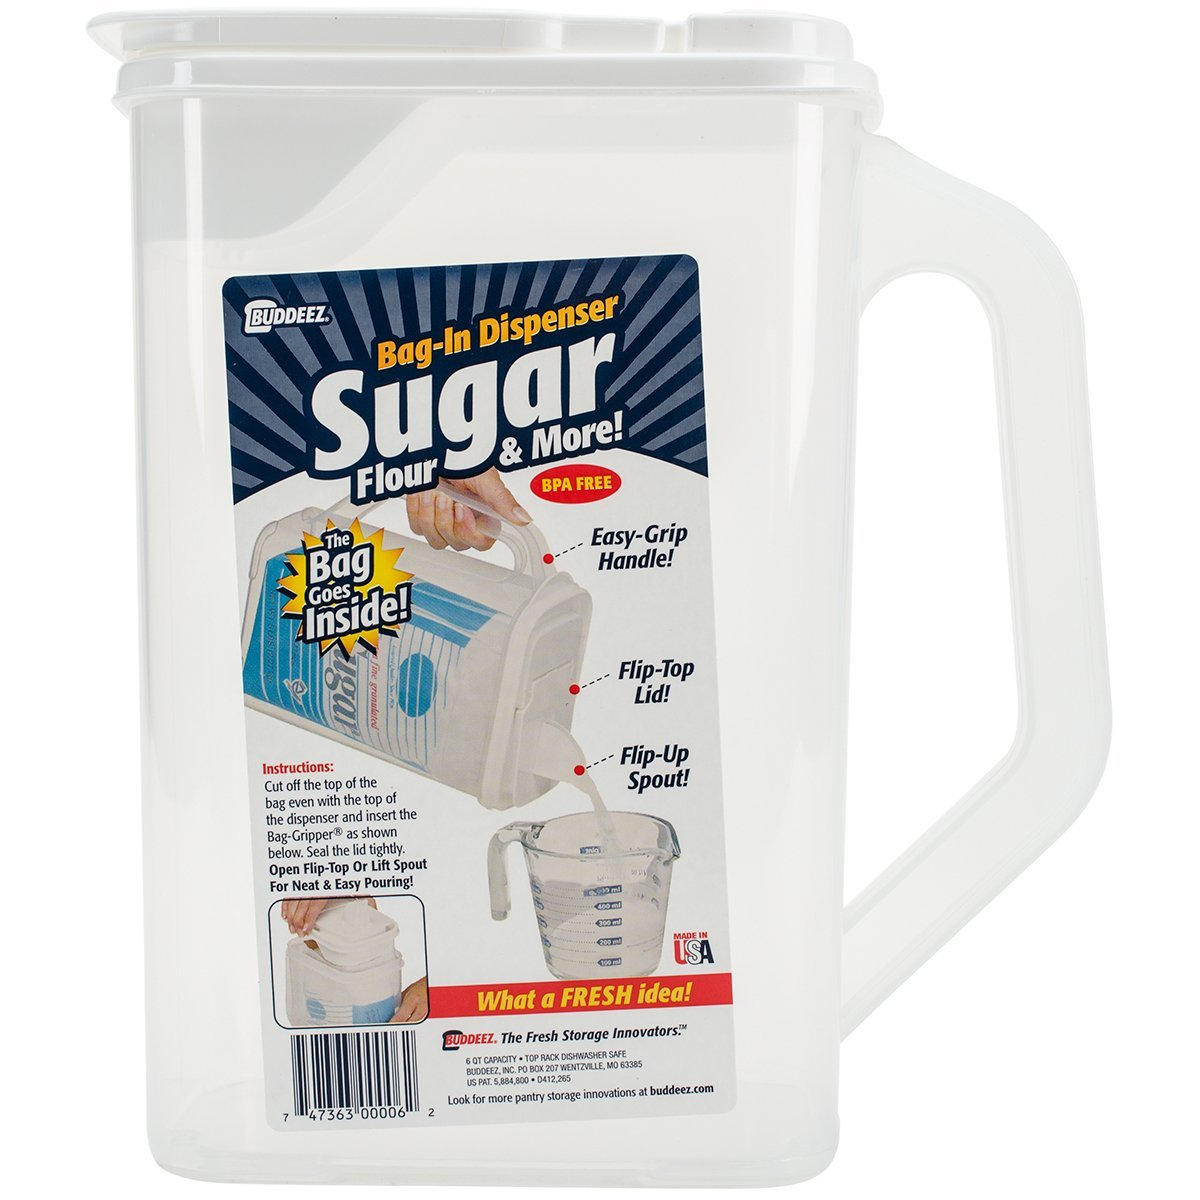 Buddeez Bag in Sugar Dispenser, 10 H x 9 W x 5 D, Clear 606